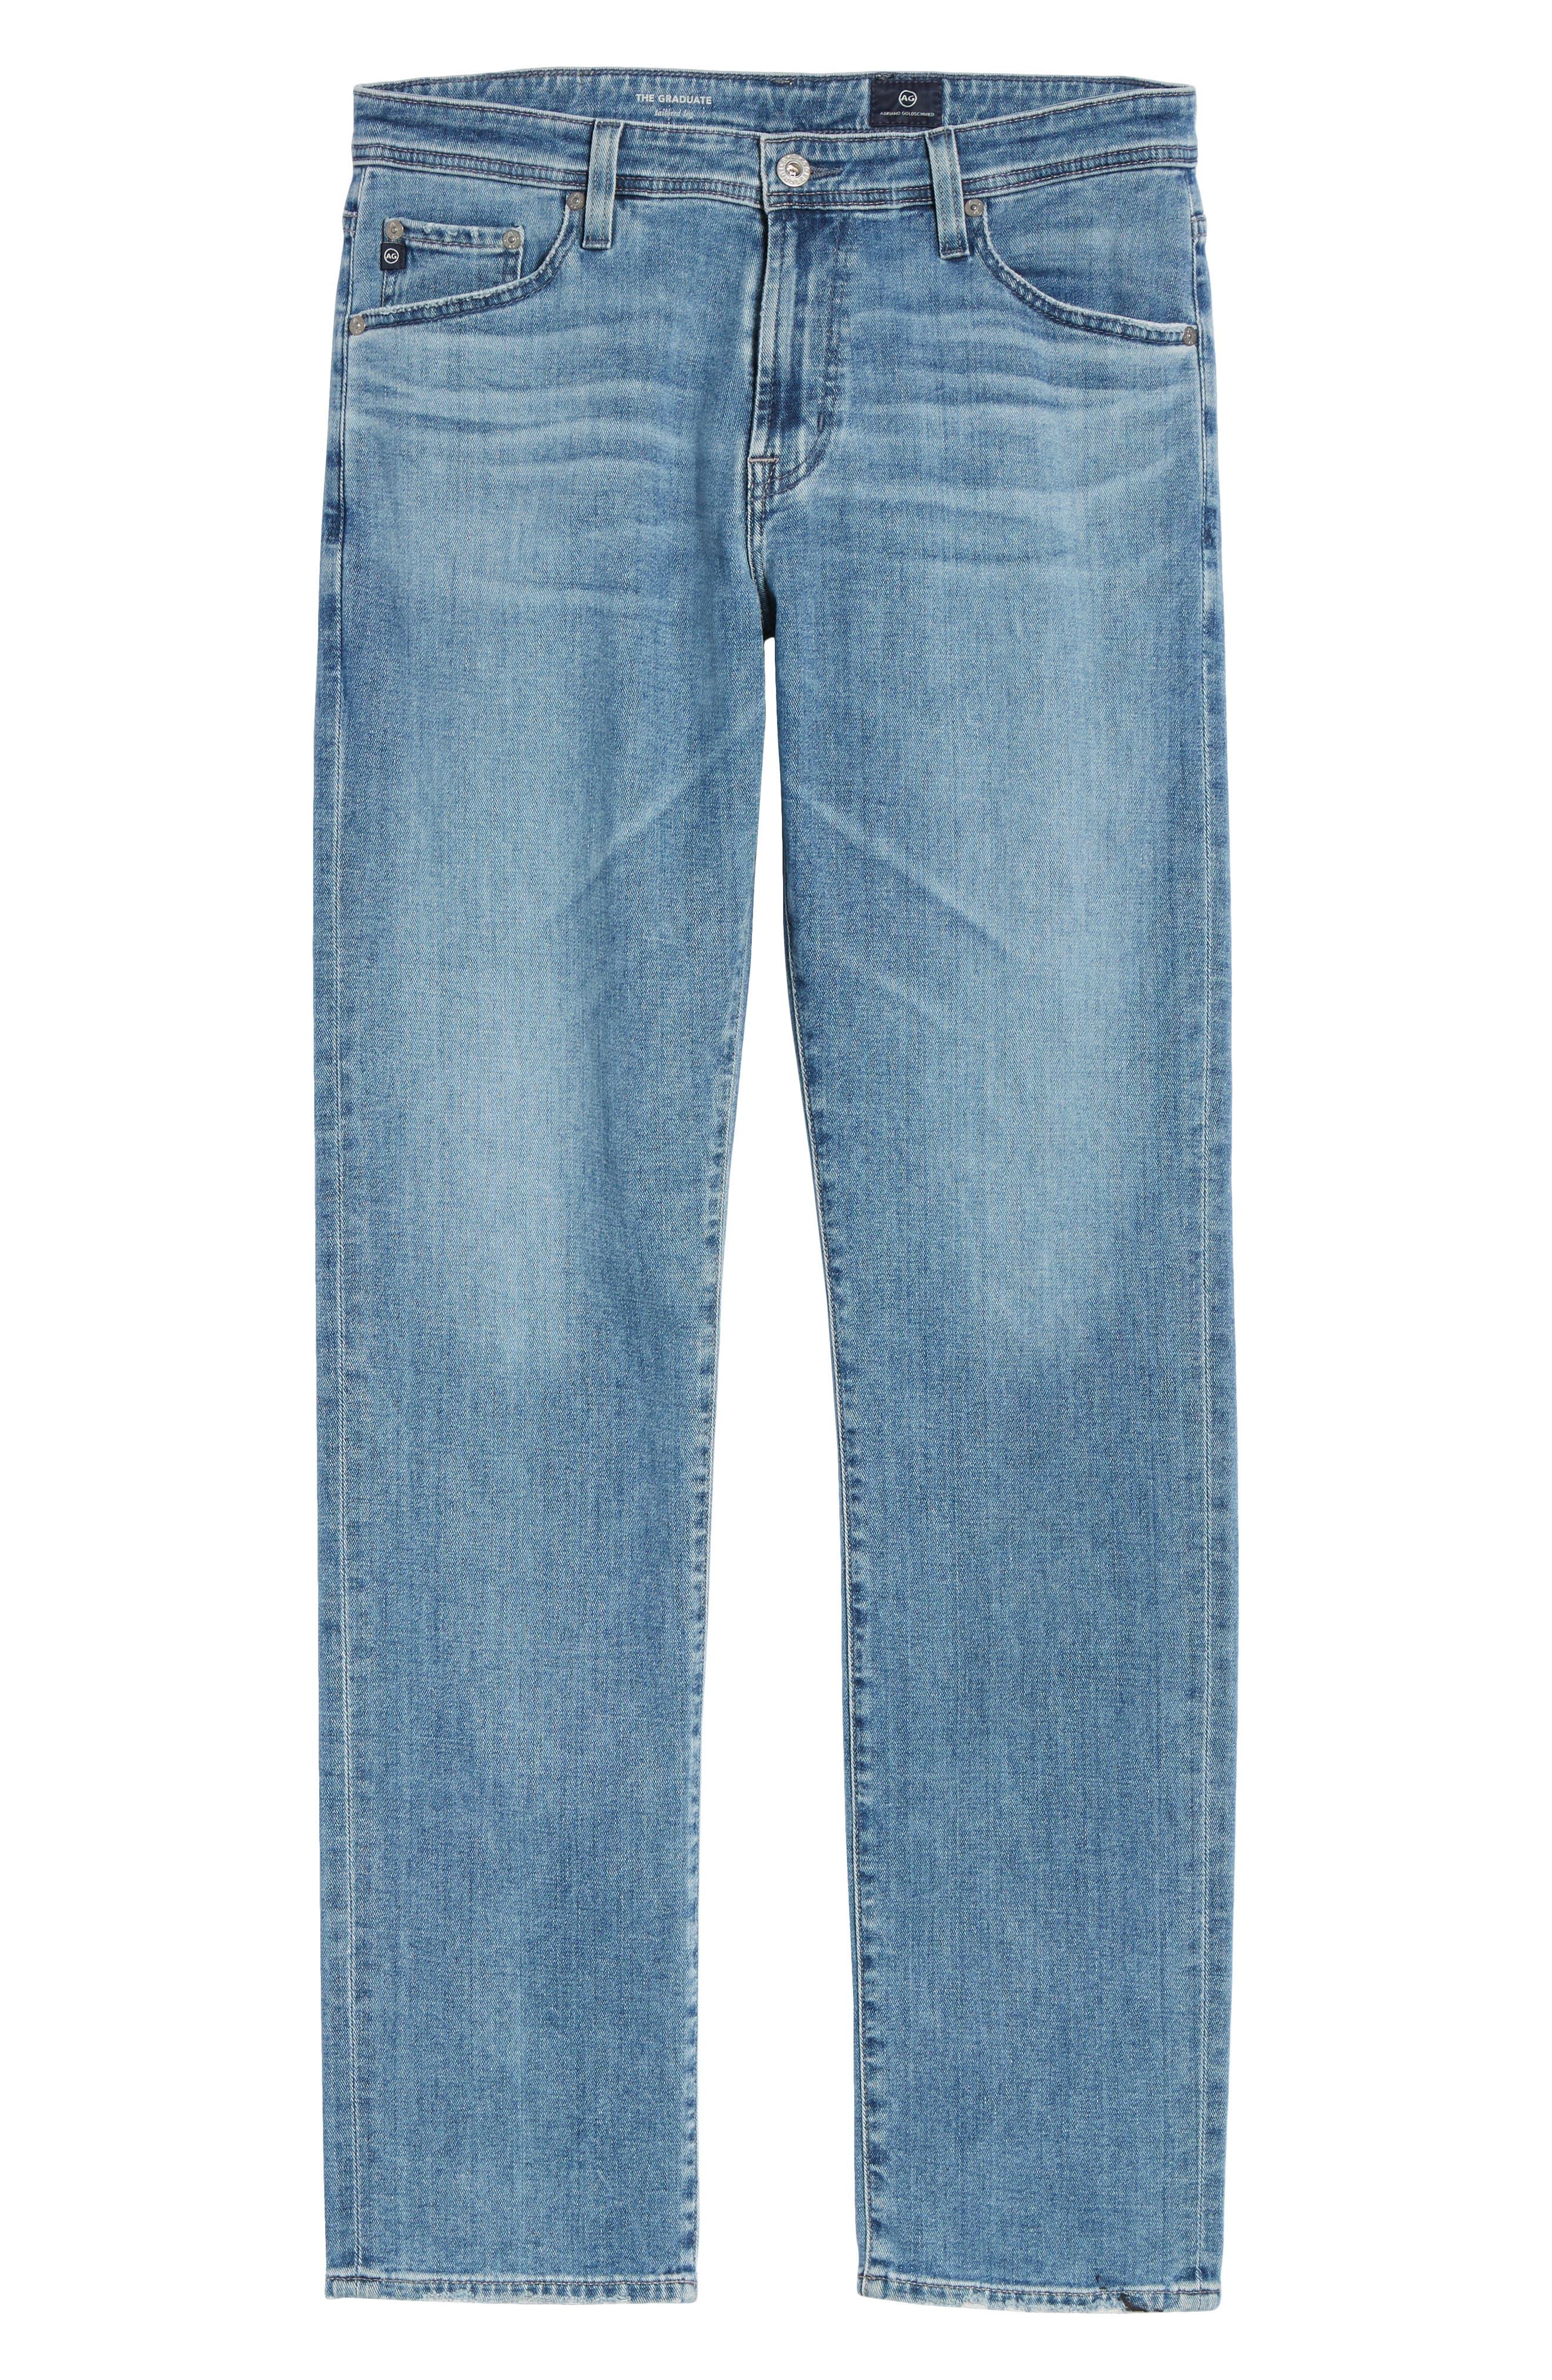 Graduate Slim Straight Leg Jeans,                             Alternate thumbnail 6, color,                             Sandpiper